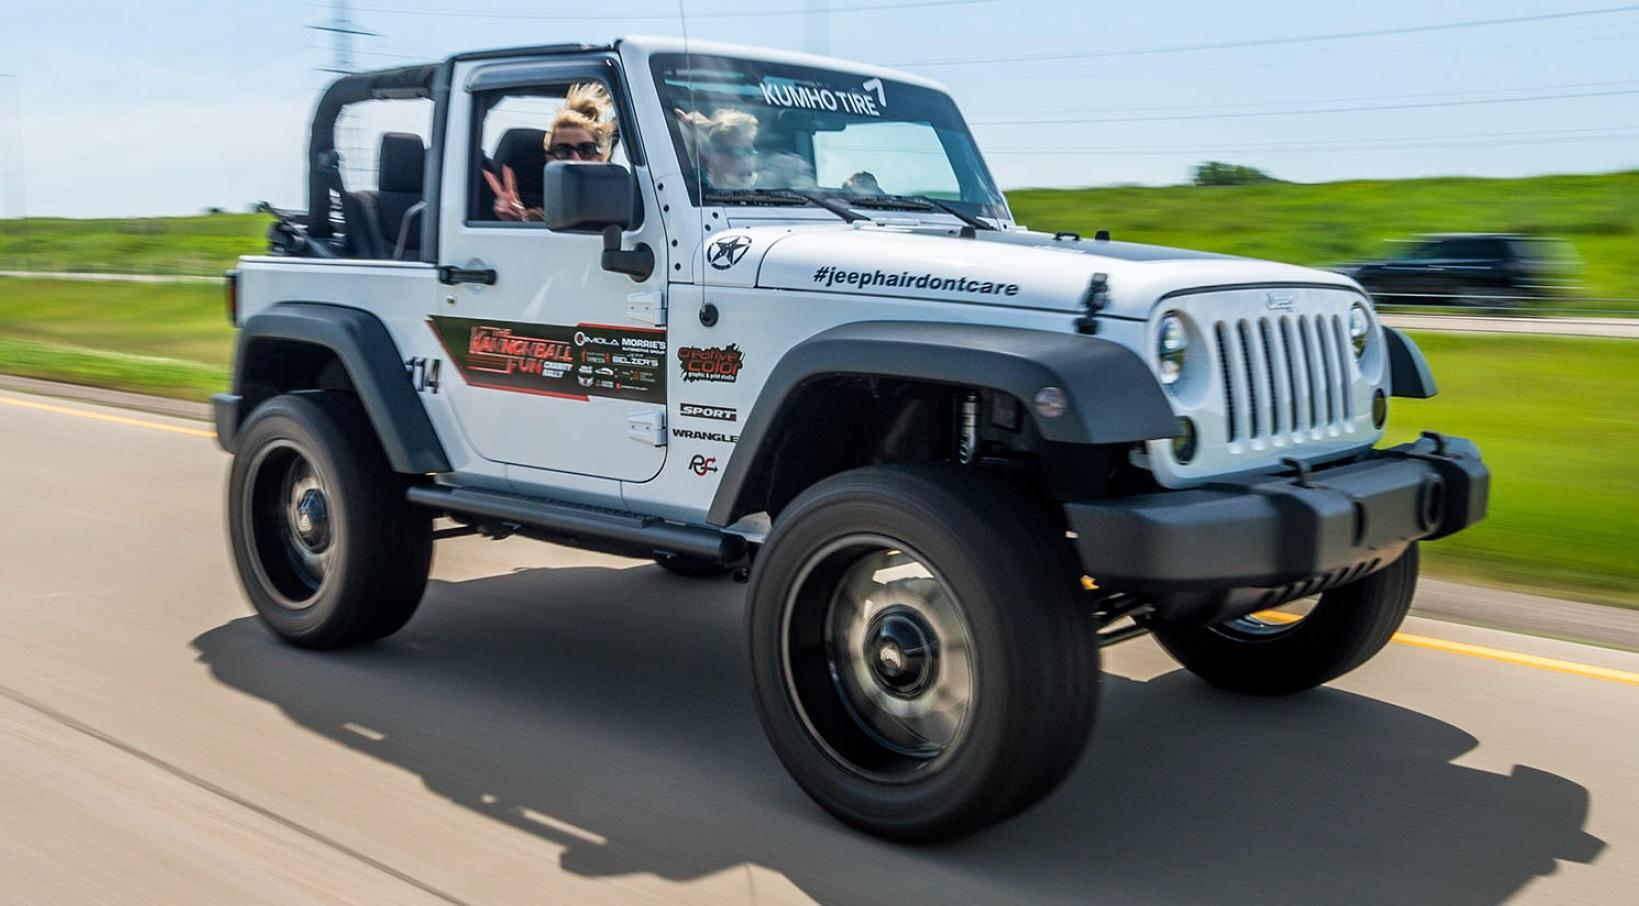 #13 Jeephairdontcare